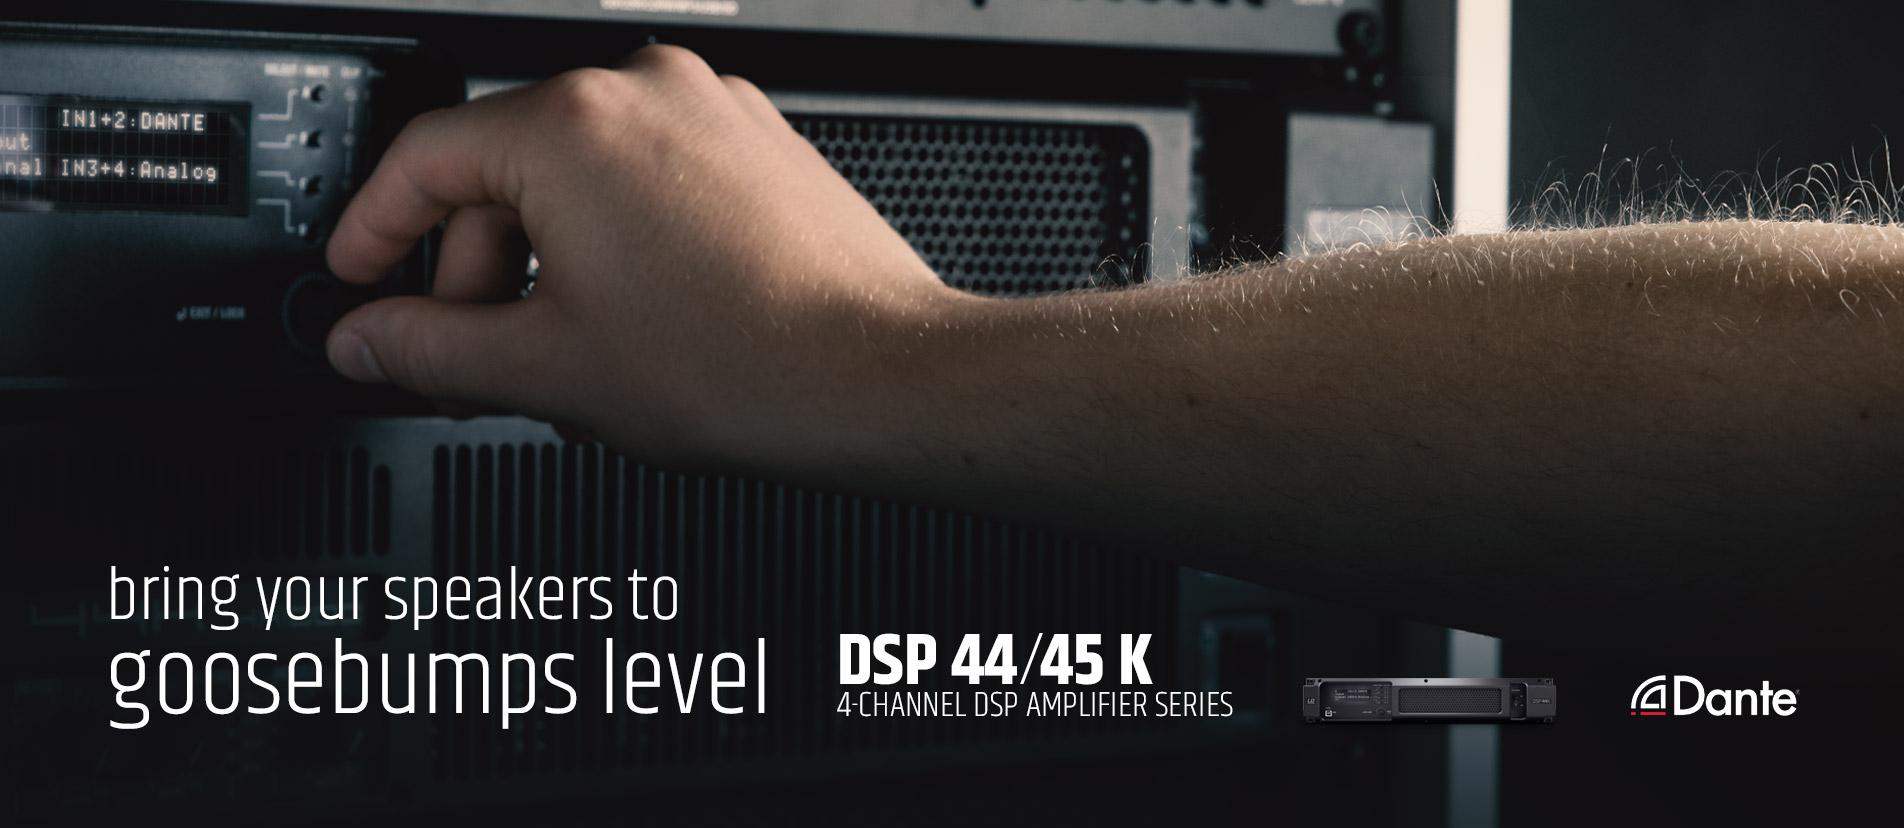 DSP44/45